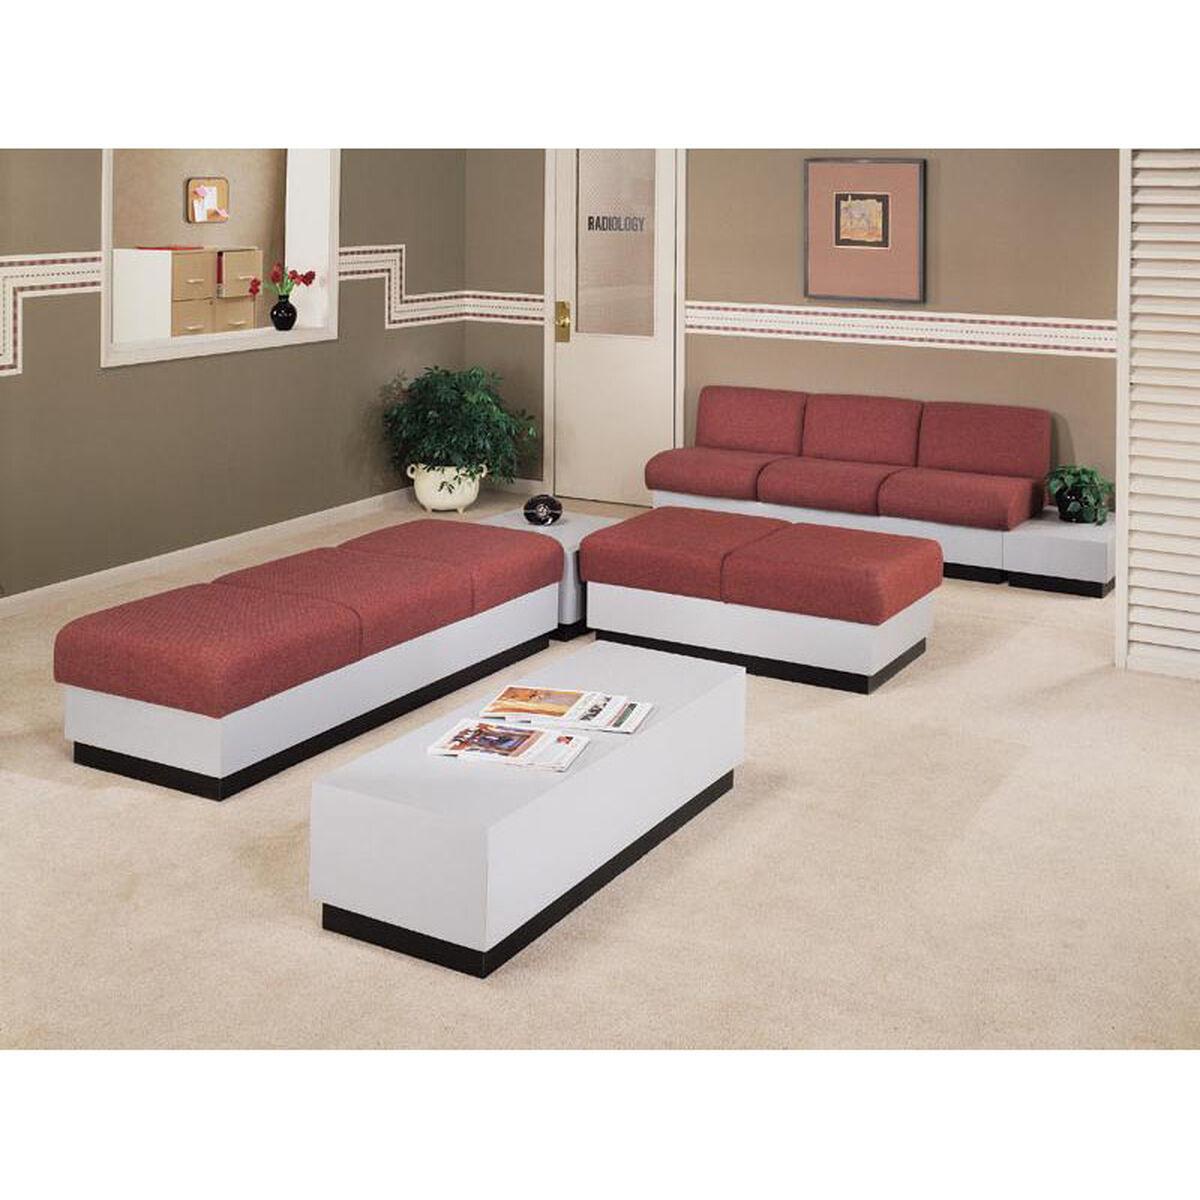 High Point Furniture Industries 7302 Hpf 7302